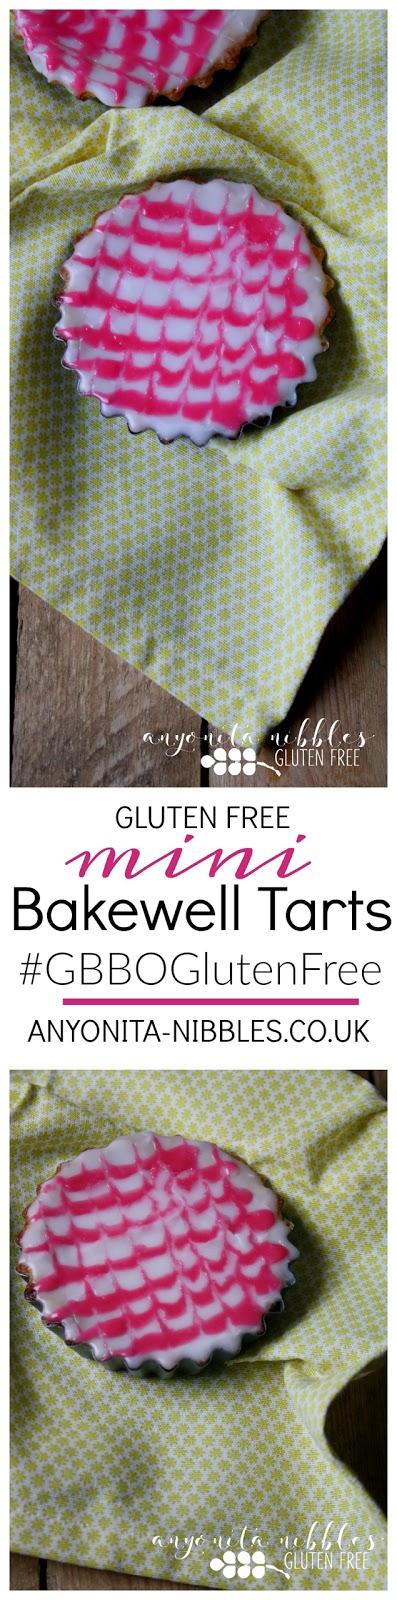 Gluten Free Mini Bakewell Tarts #GBBOGlutenFree | Anyonita Nibbles